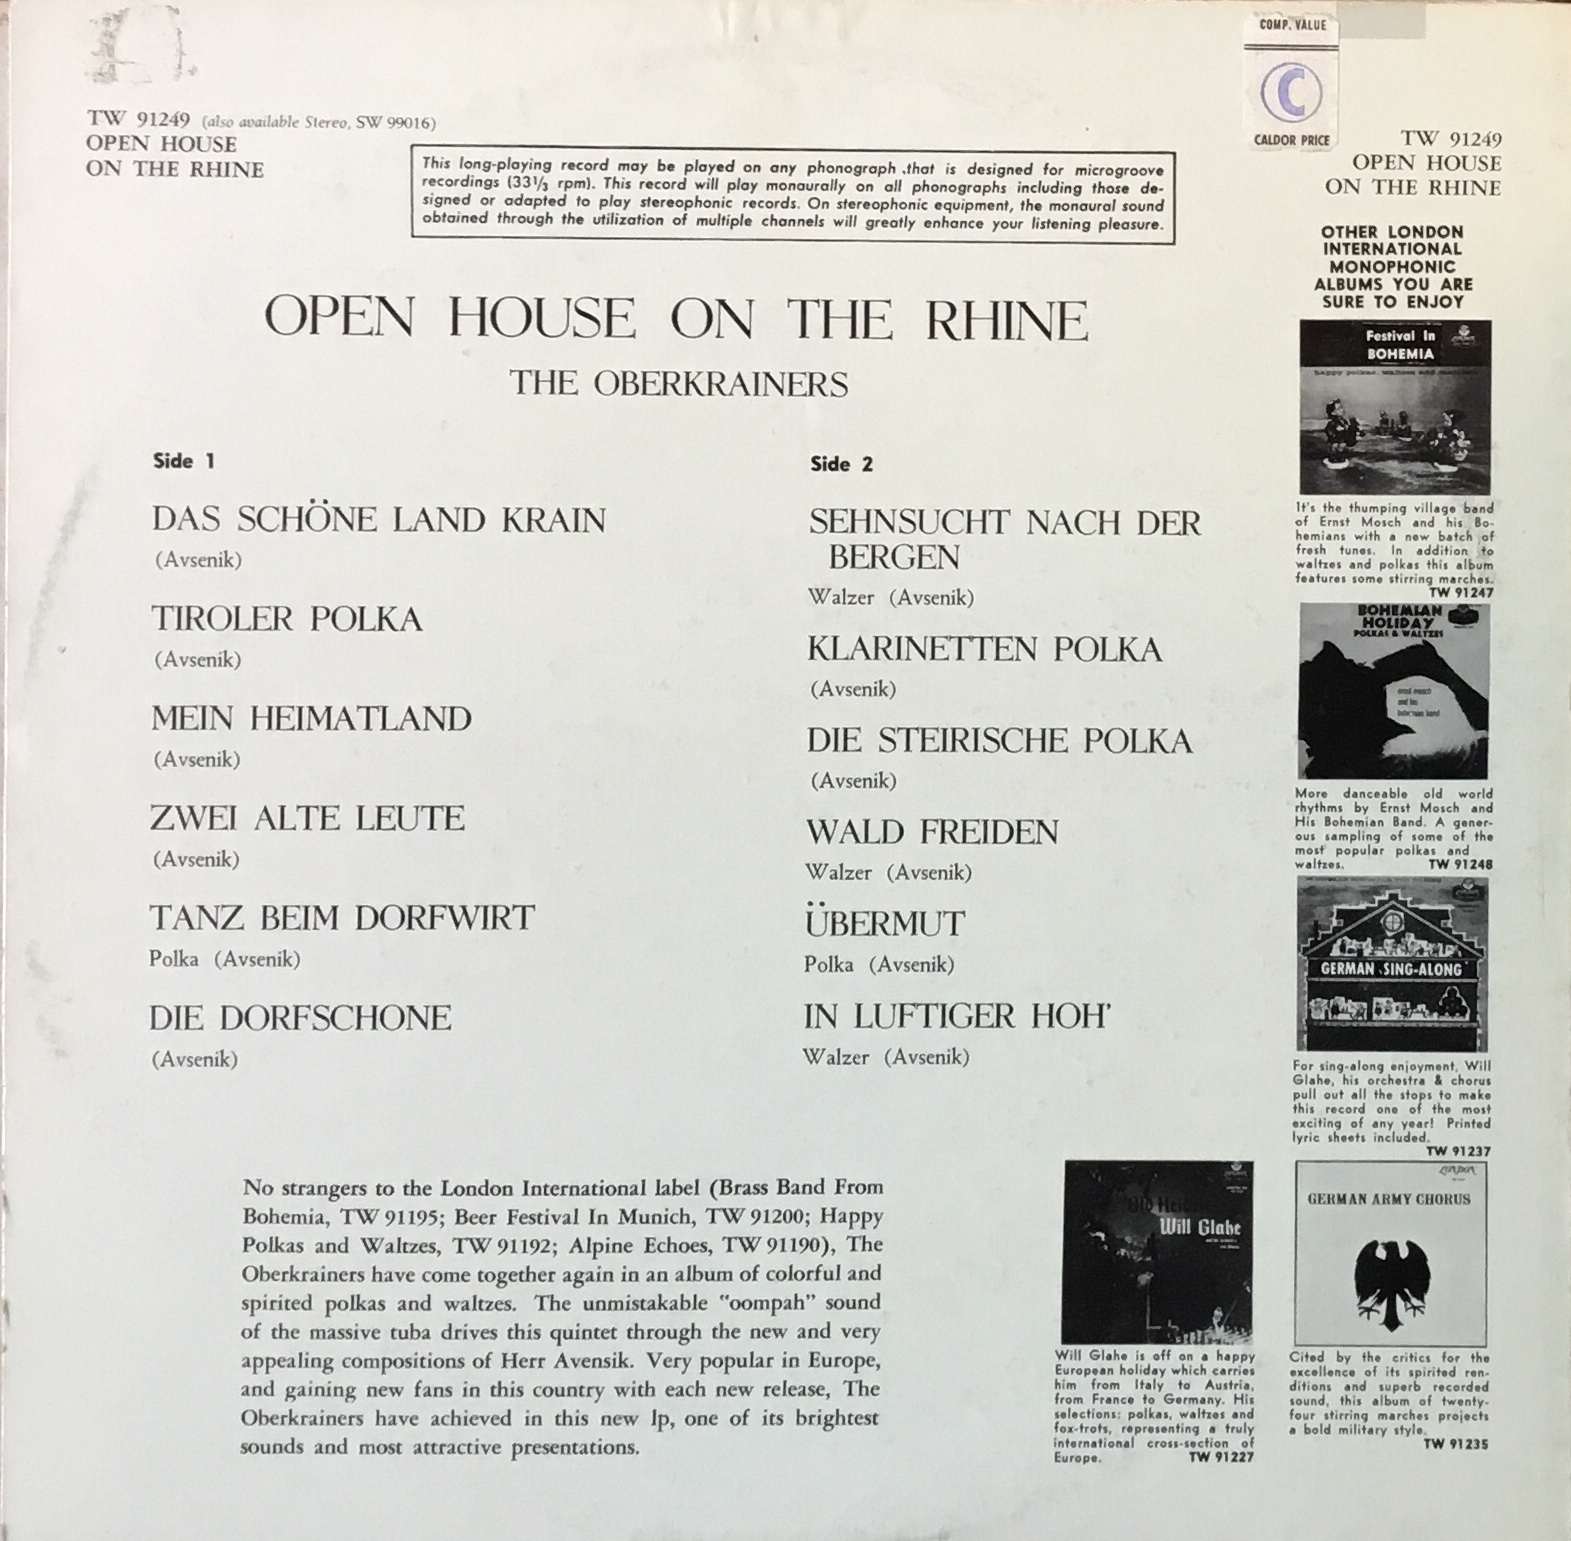 openhouse on the rhineb